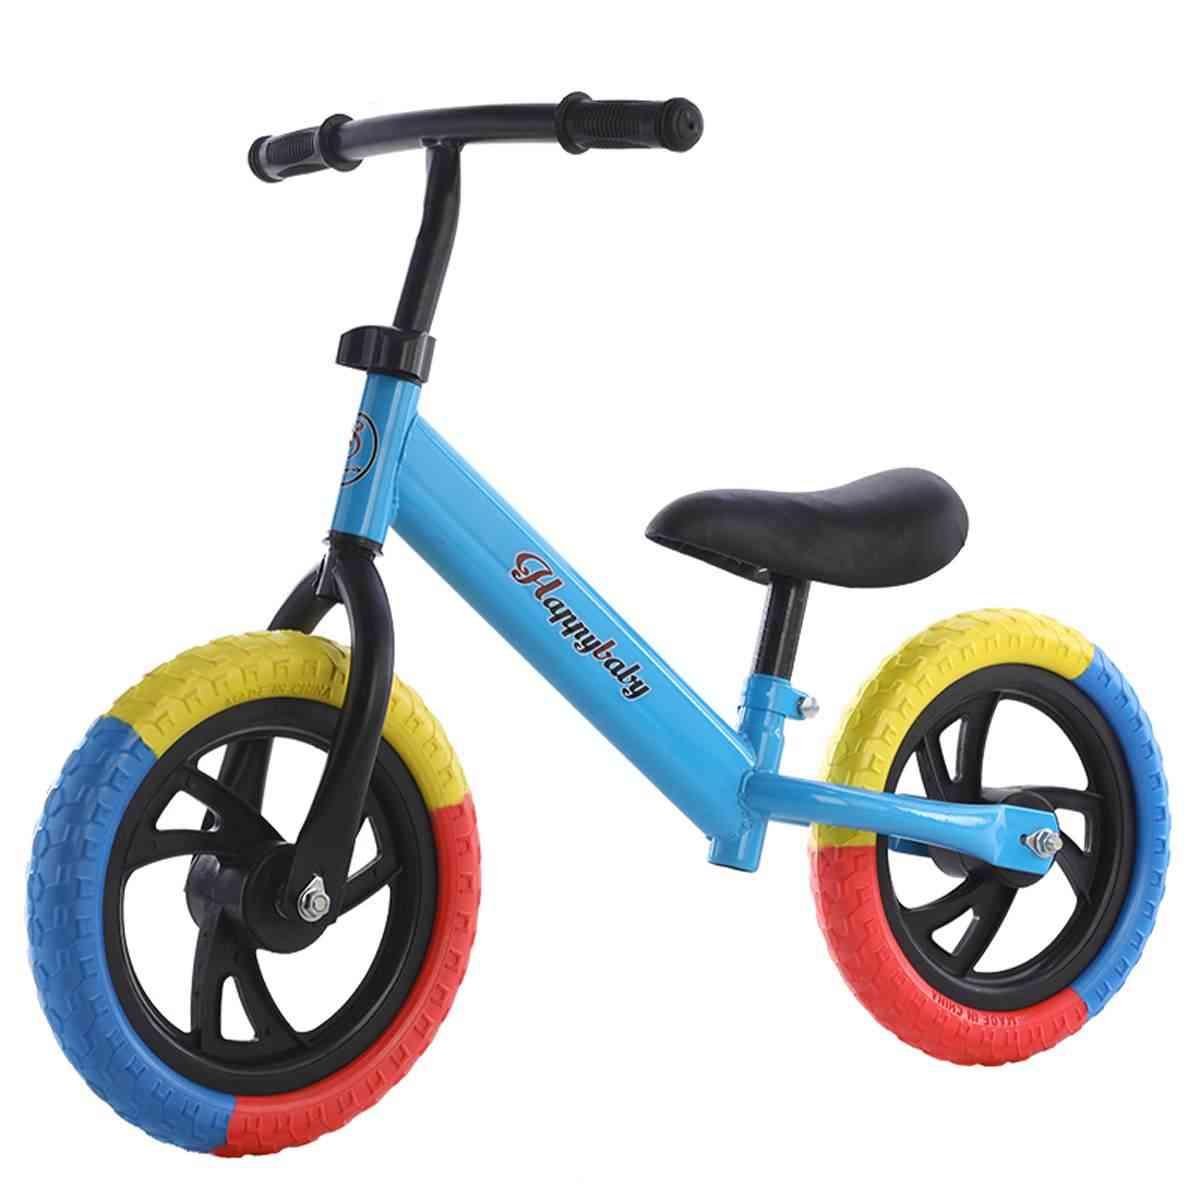 Kid's Balance Bike With No Pedal